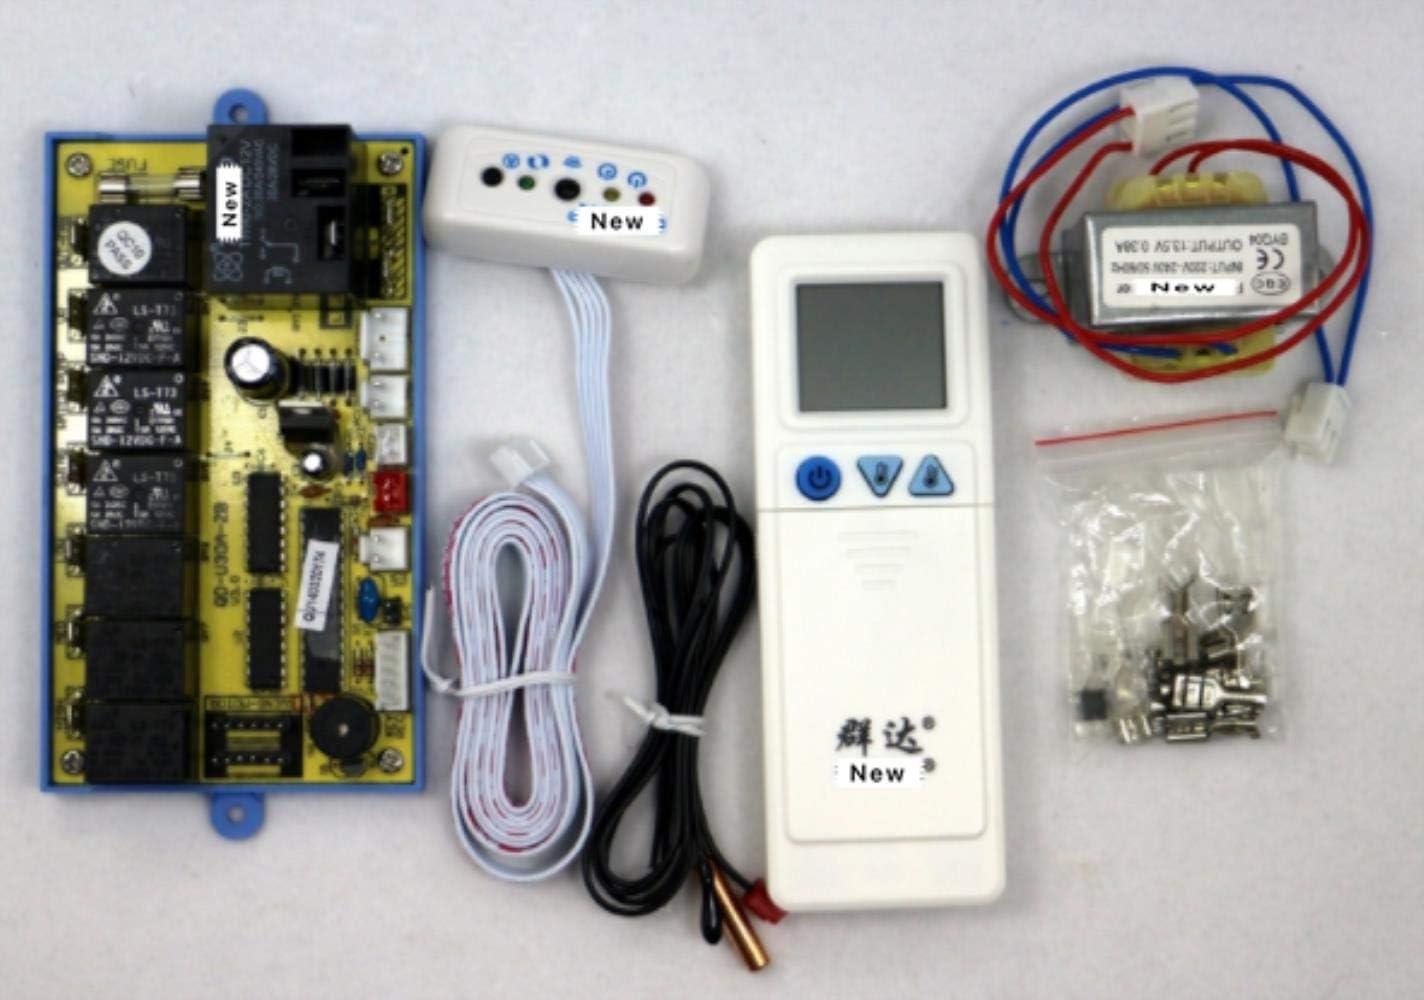 Miwaimao Aire acondicionado universal de la junta QD-U30A Techo de la m/áquina de succi/ón refit universal de la junta de la computadora de la junta de control de